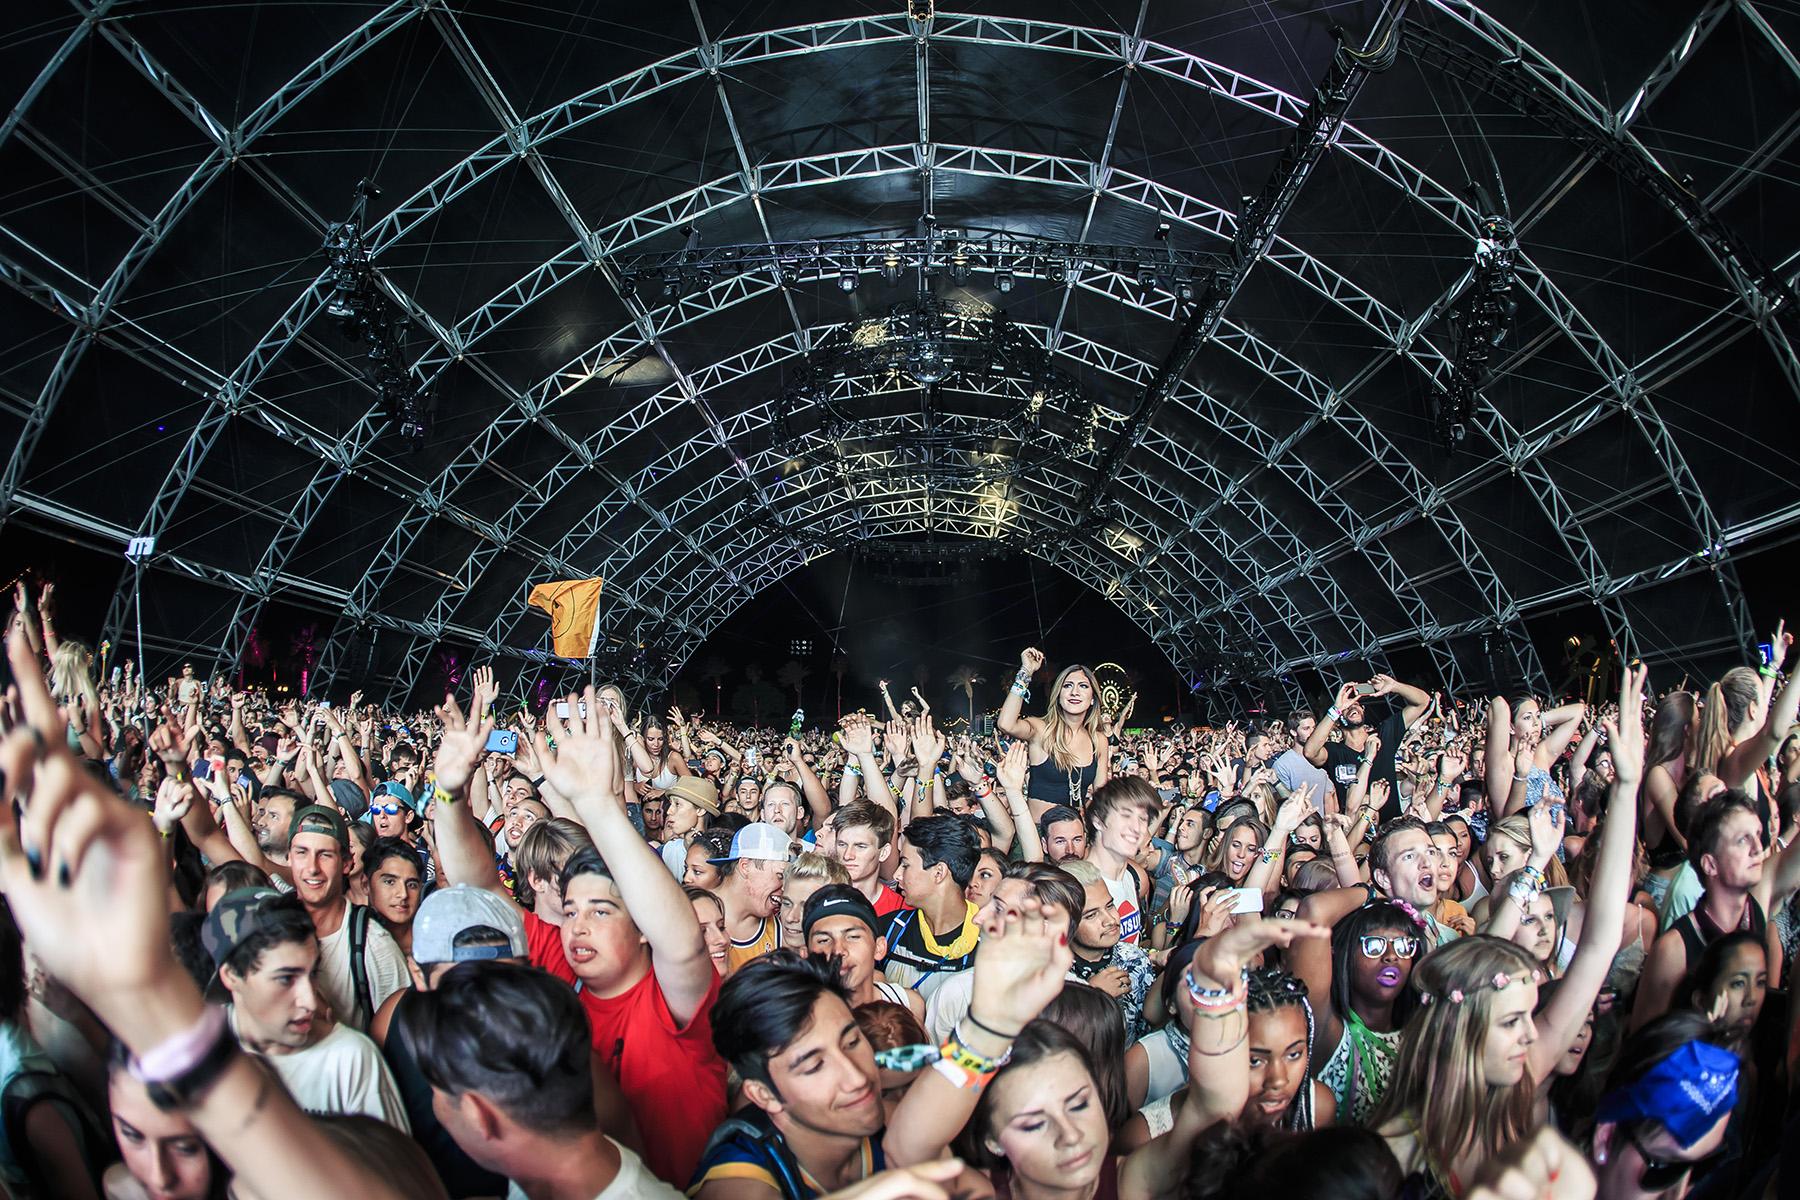 3f8fbc5604 40 Best Things We Saw at Coachella 2015 – Rolling Stone